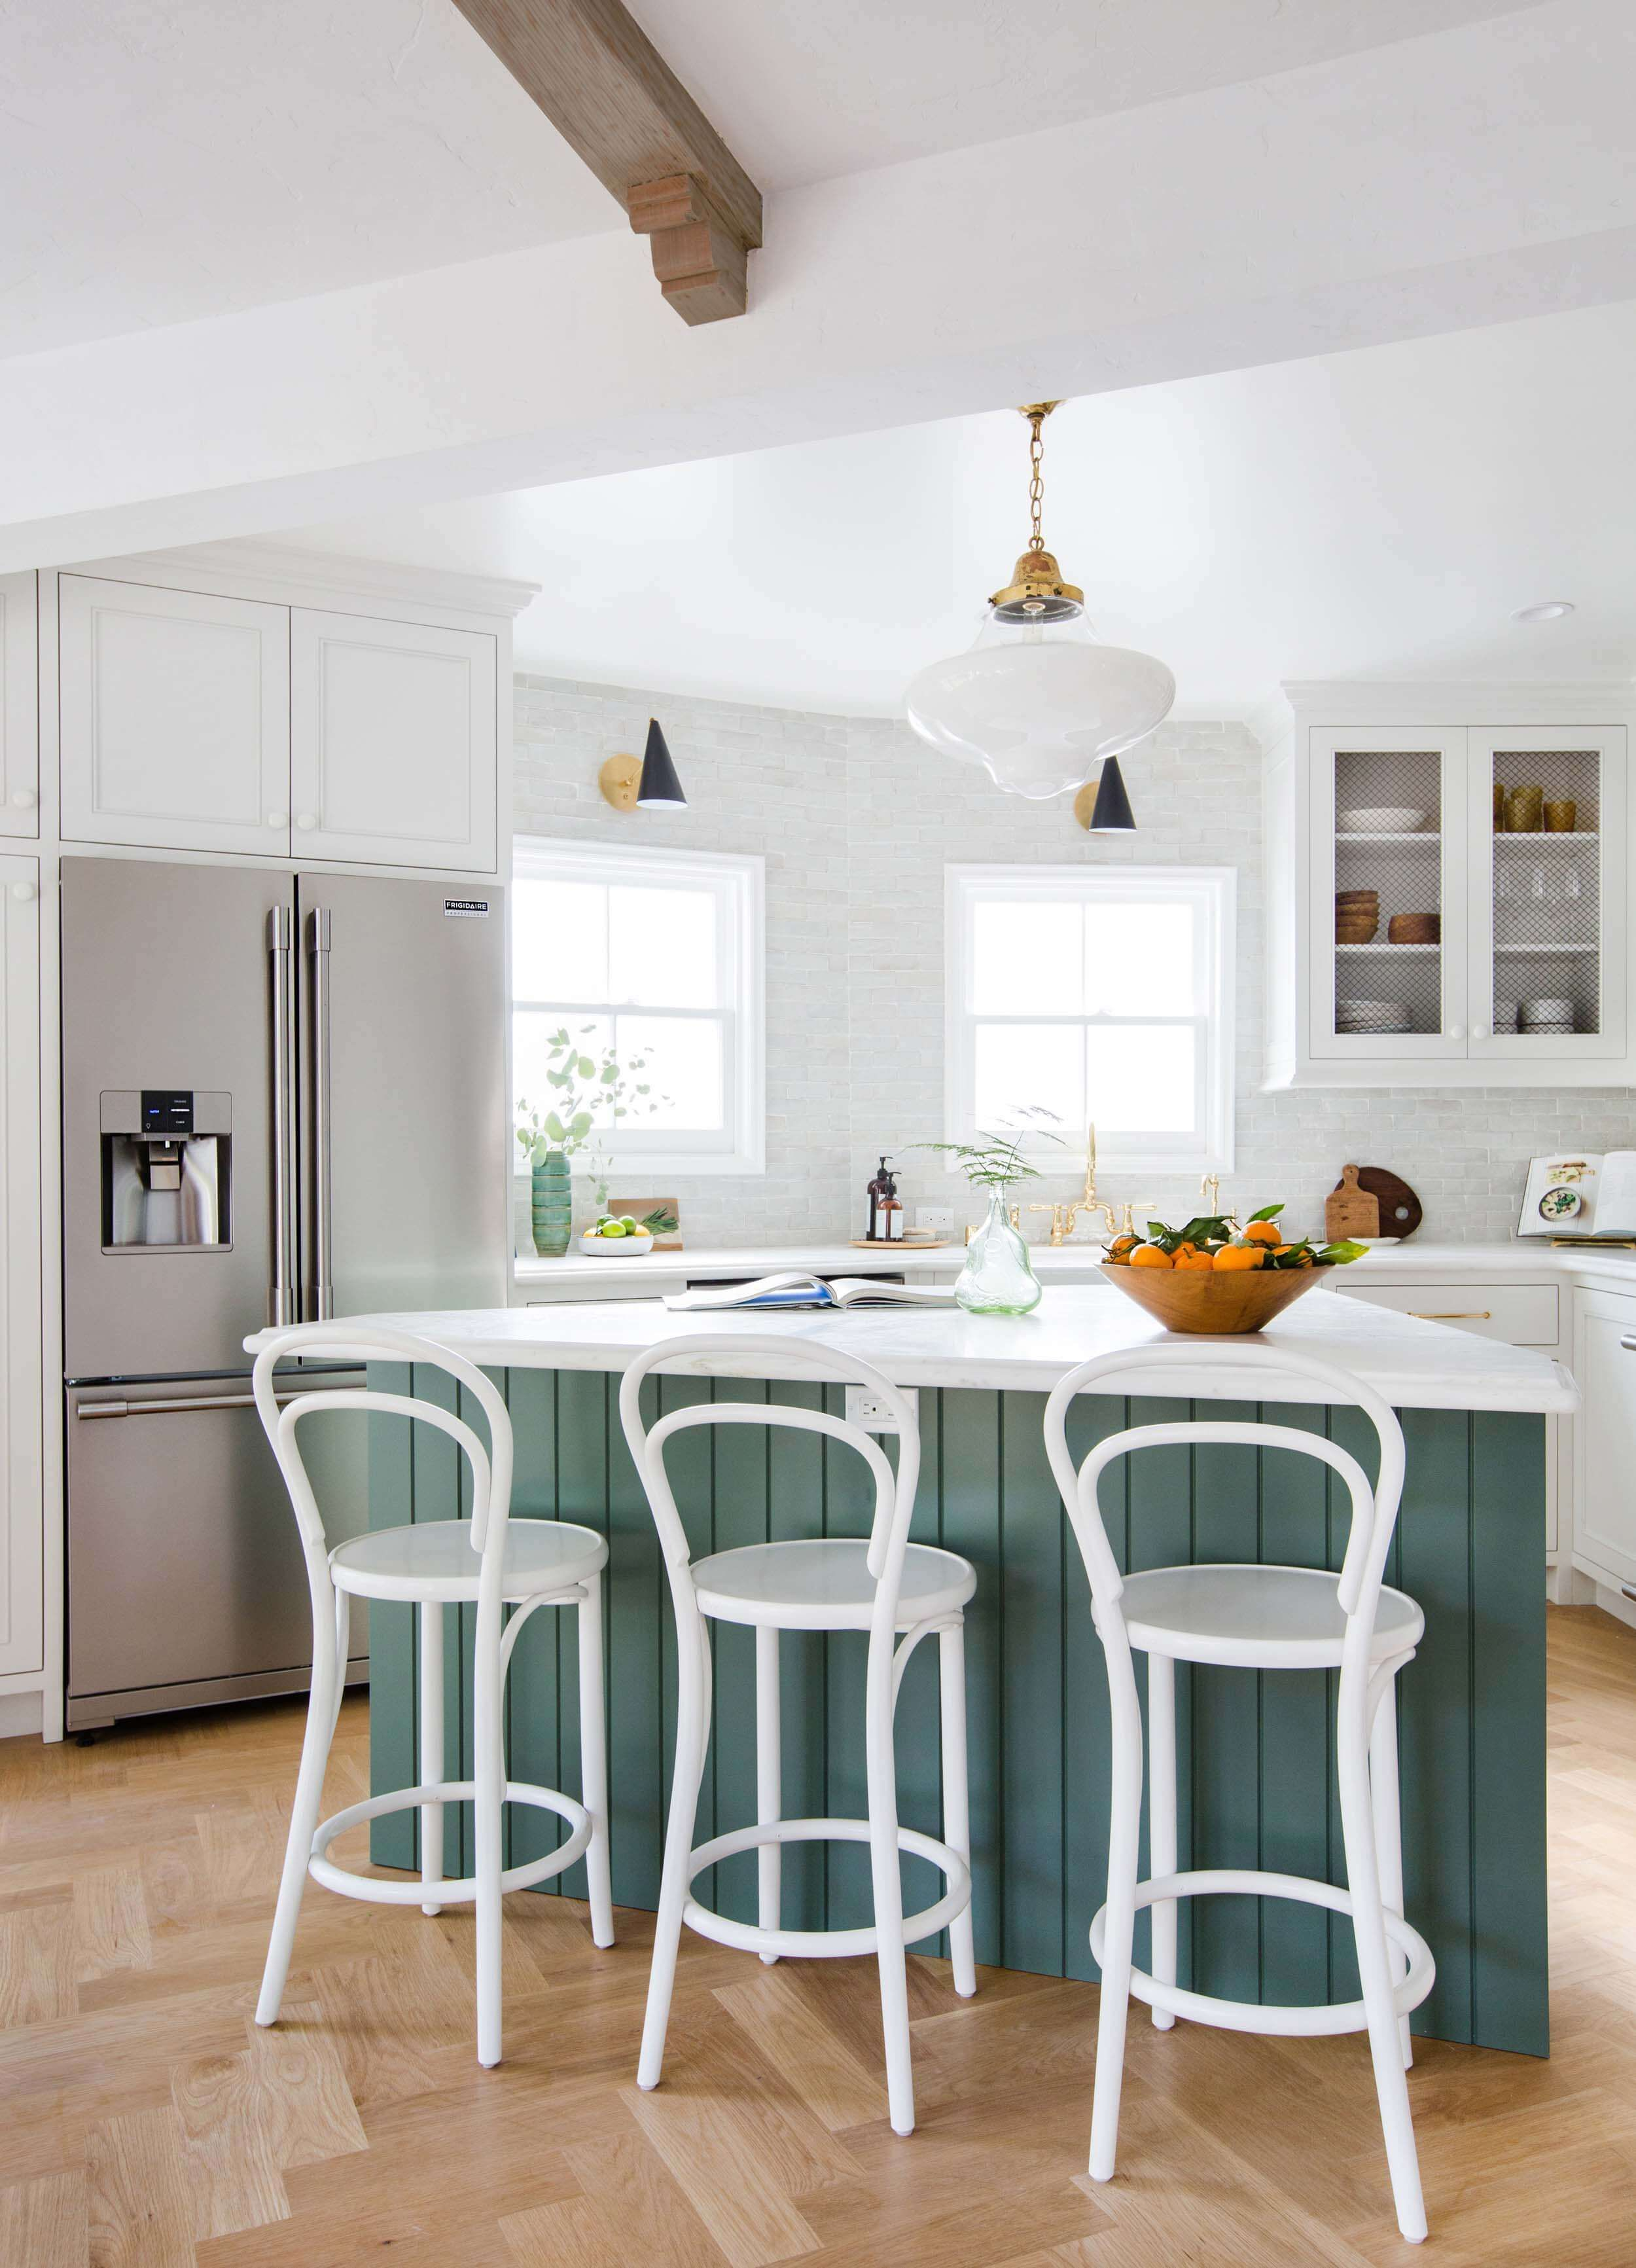 emily-henderson_frigidaire_kitchen-reveal_waverly_english ...